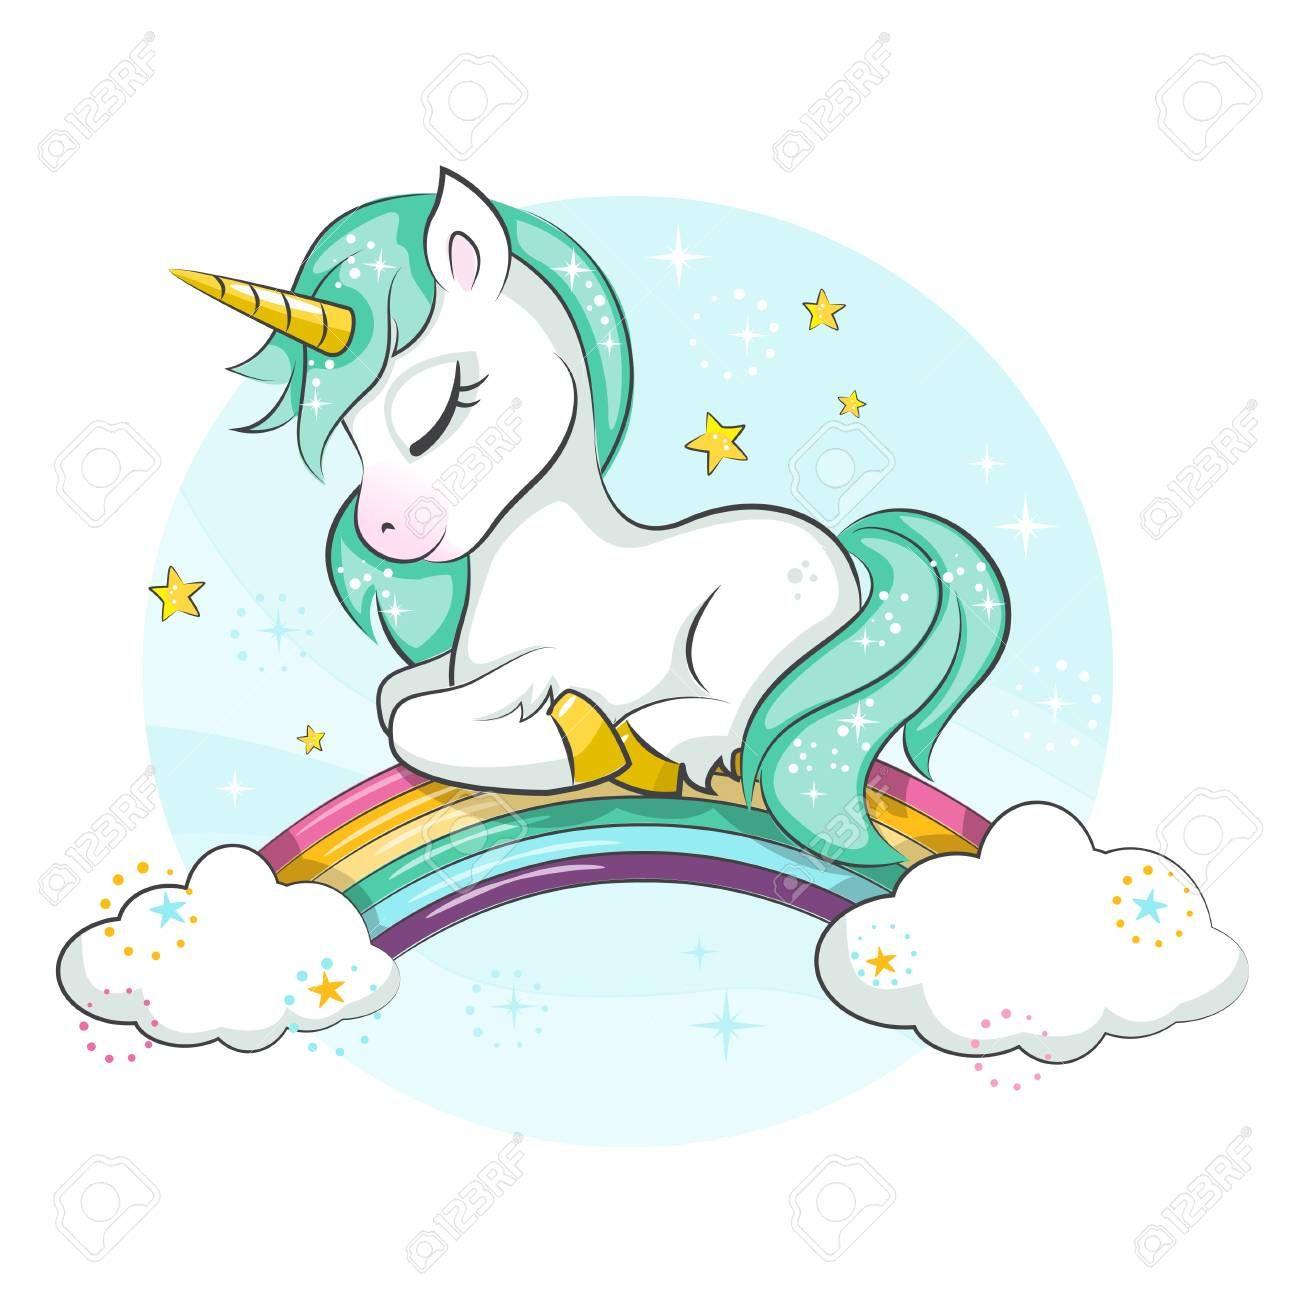 Pin By Jennie Go On Tokidoki Pinterest Unicorn Magical Unicorn